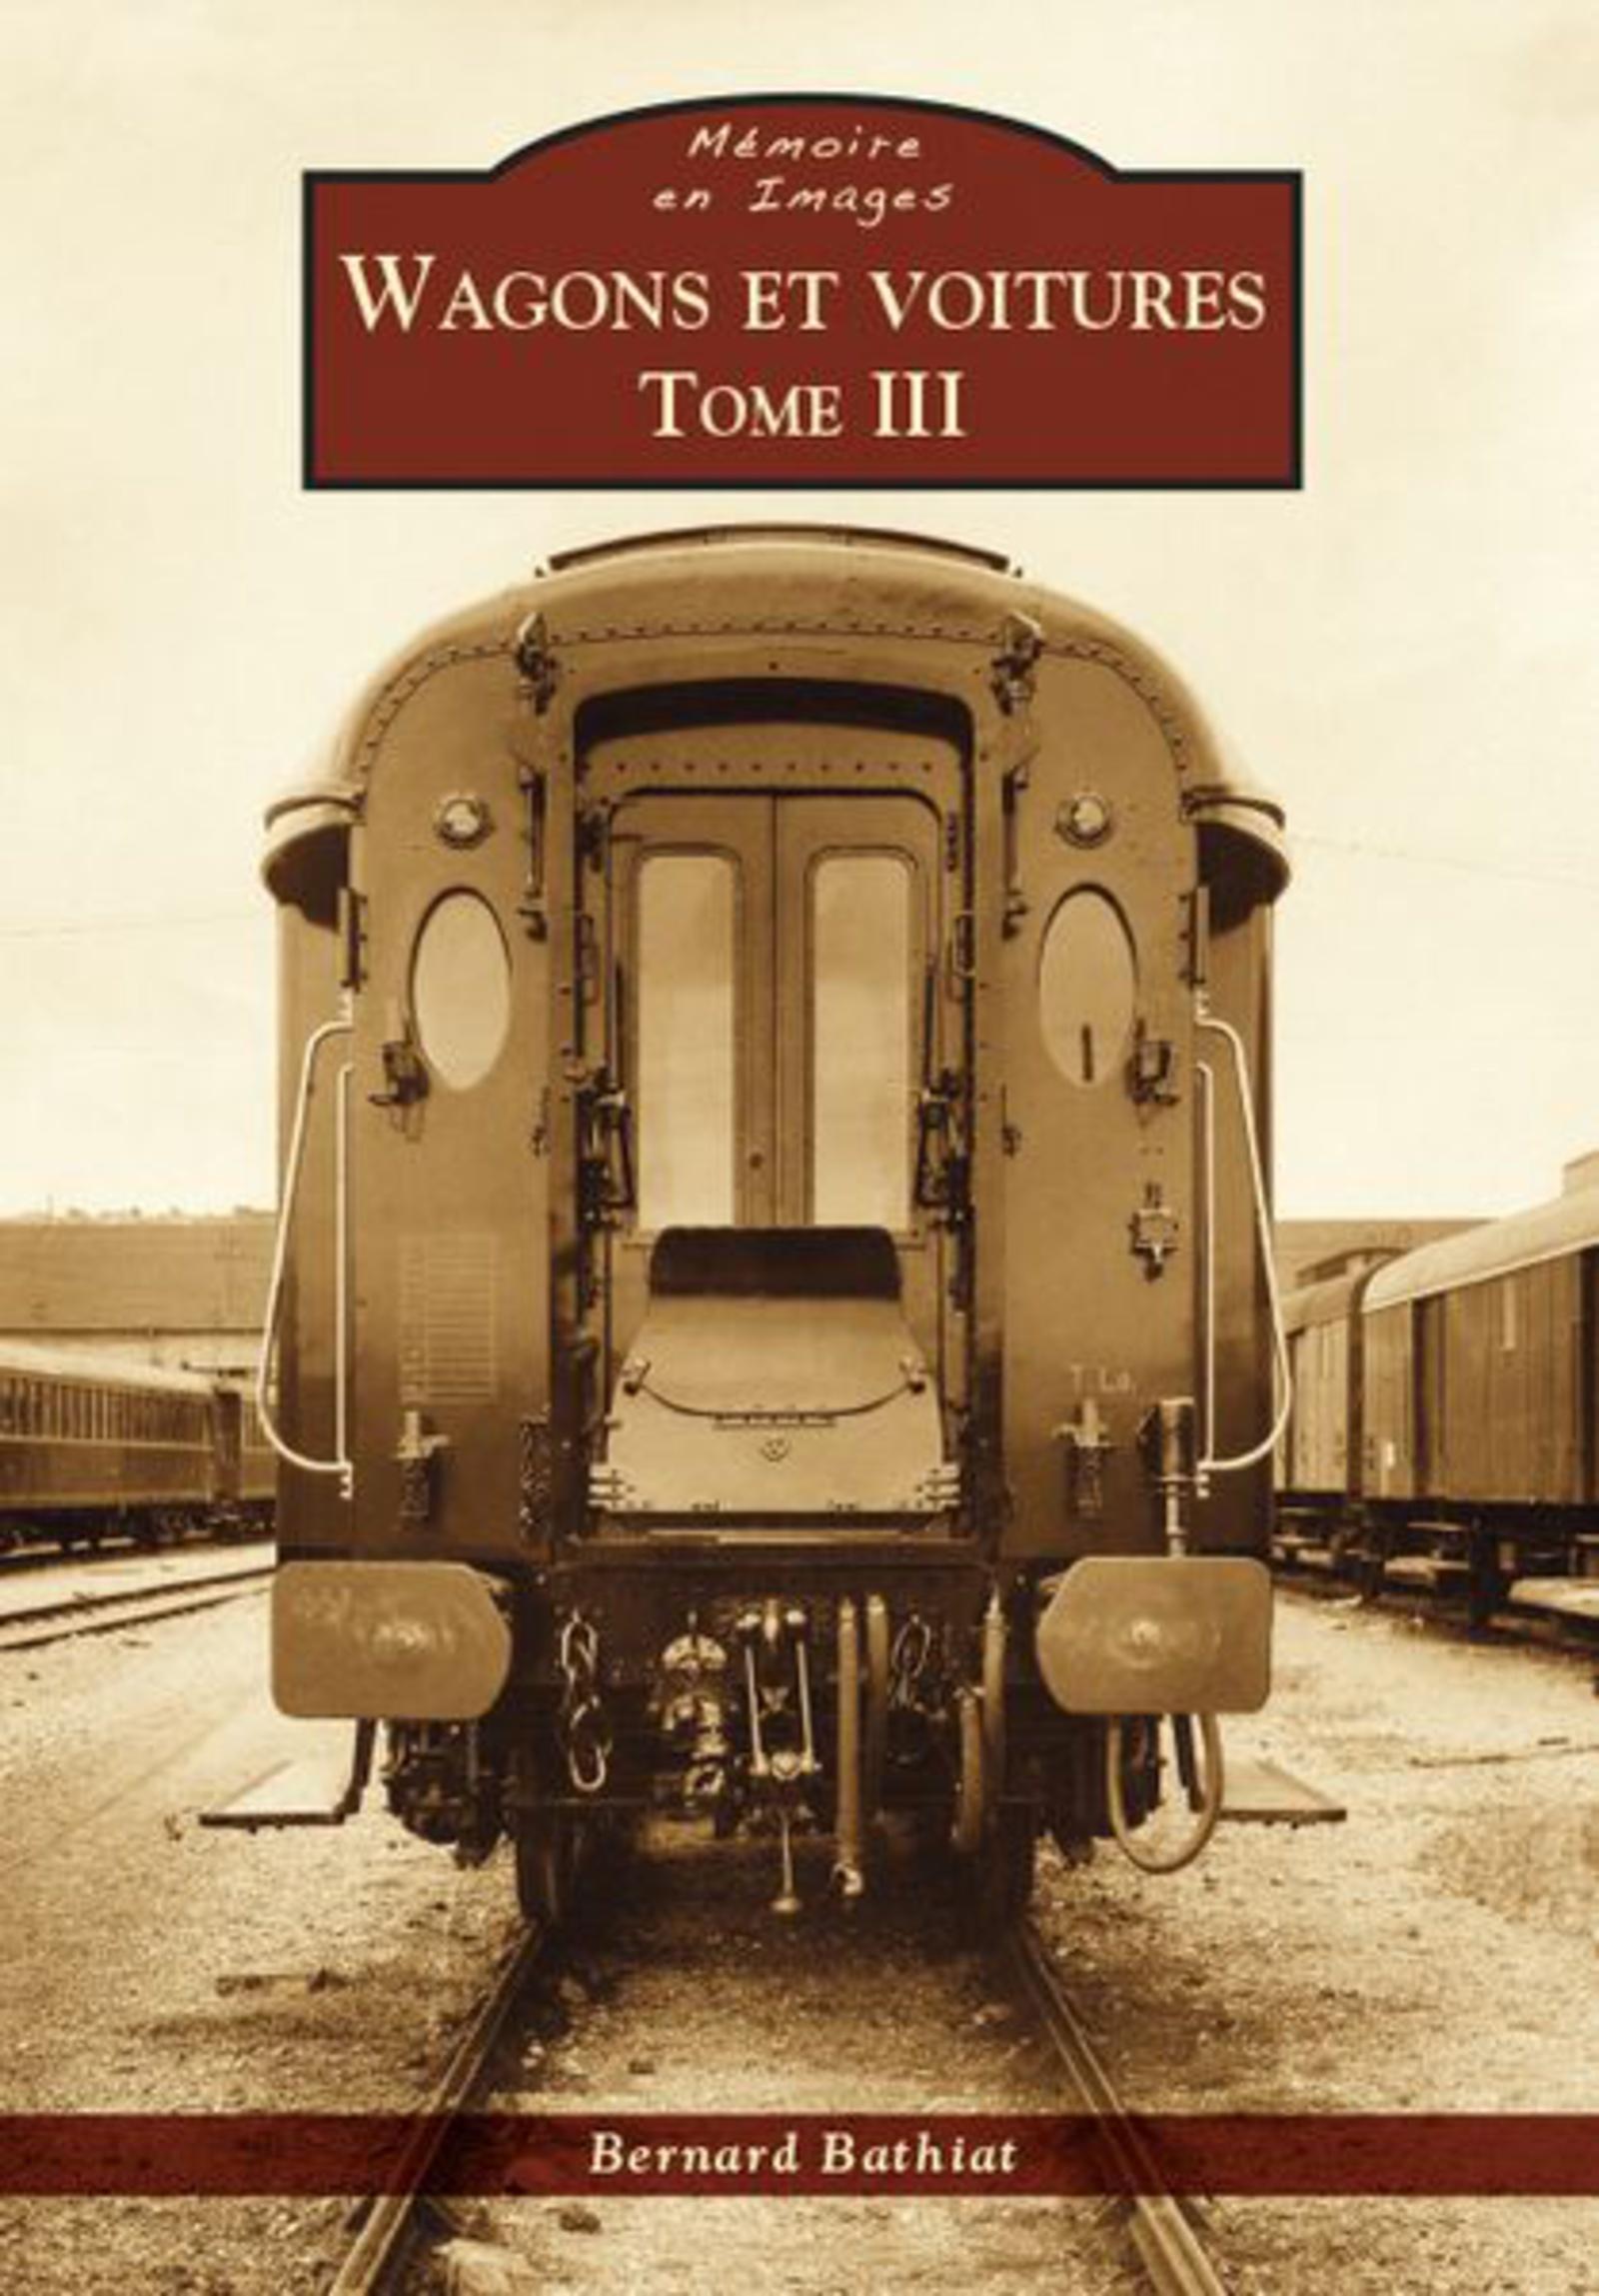 WAGONS ET VOITURES TOME III